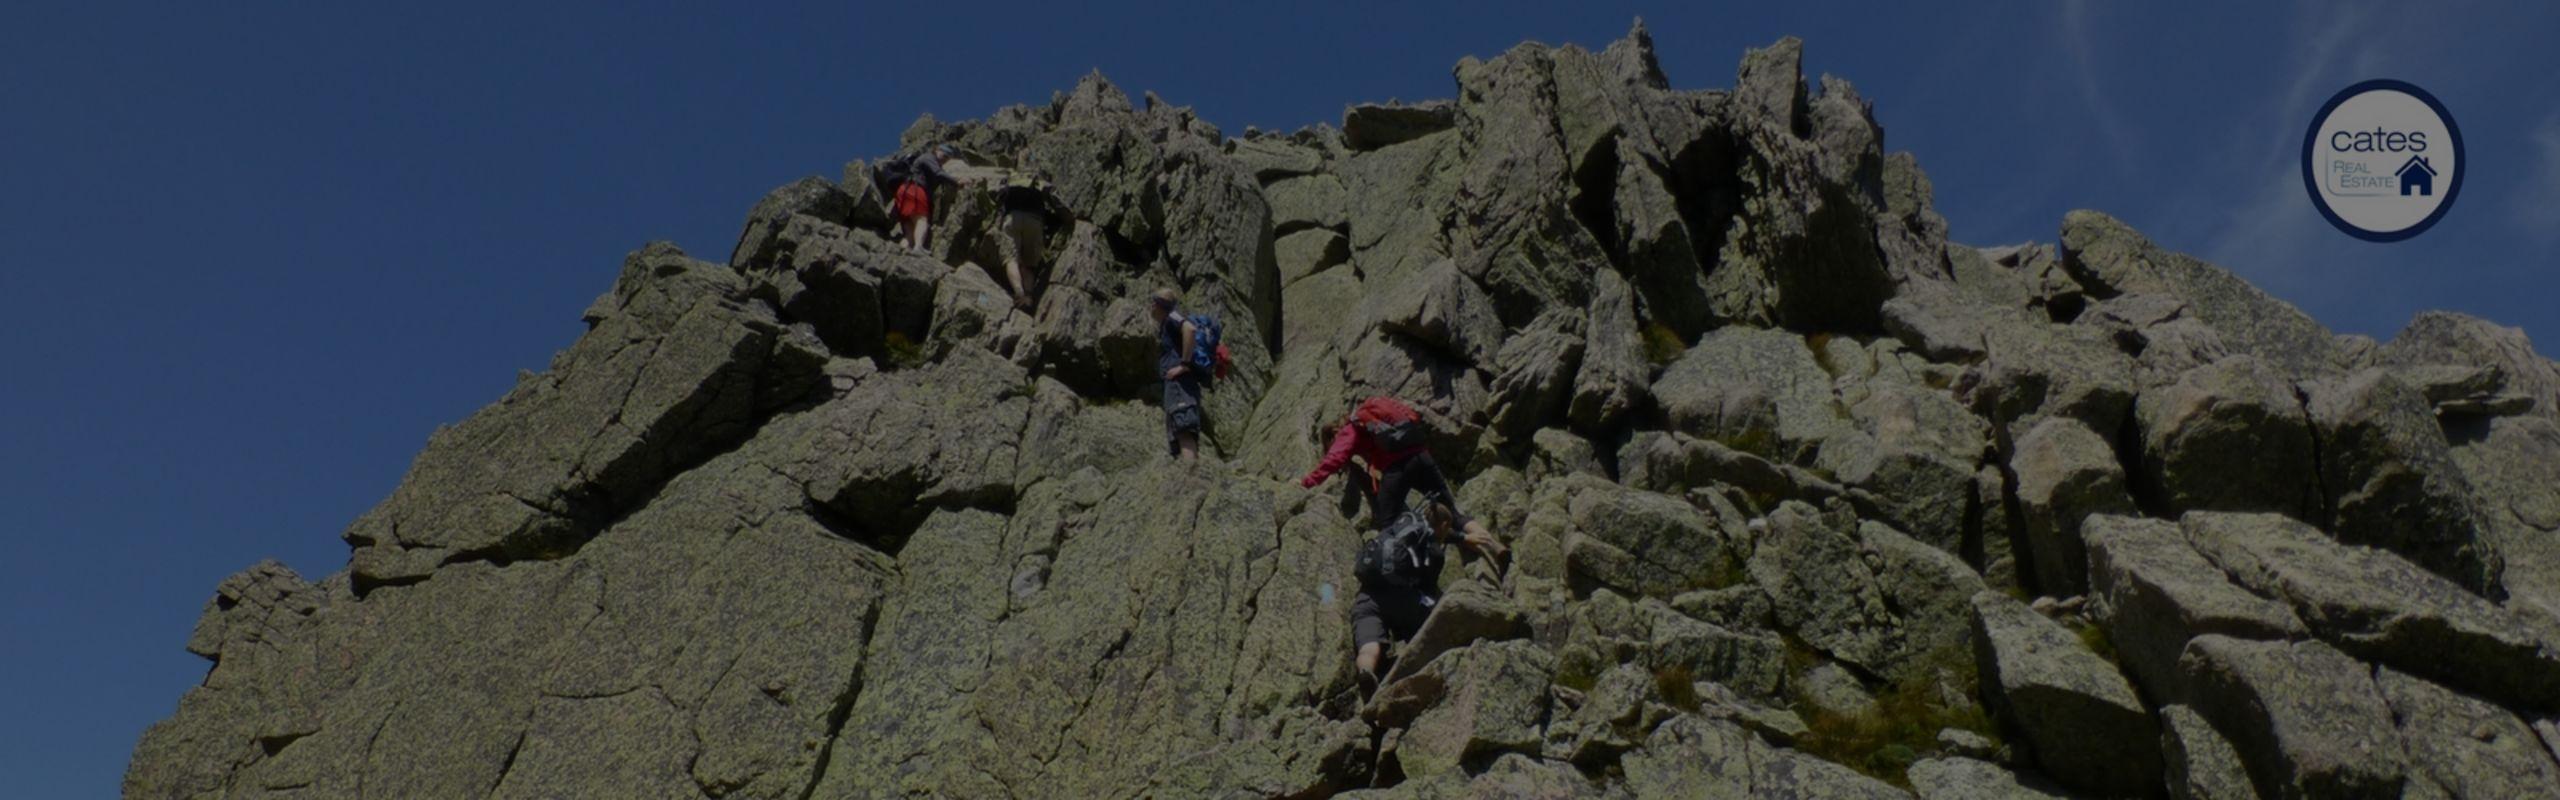 Go outside, overcome fears, climb a mountain